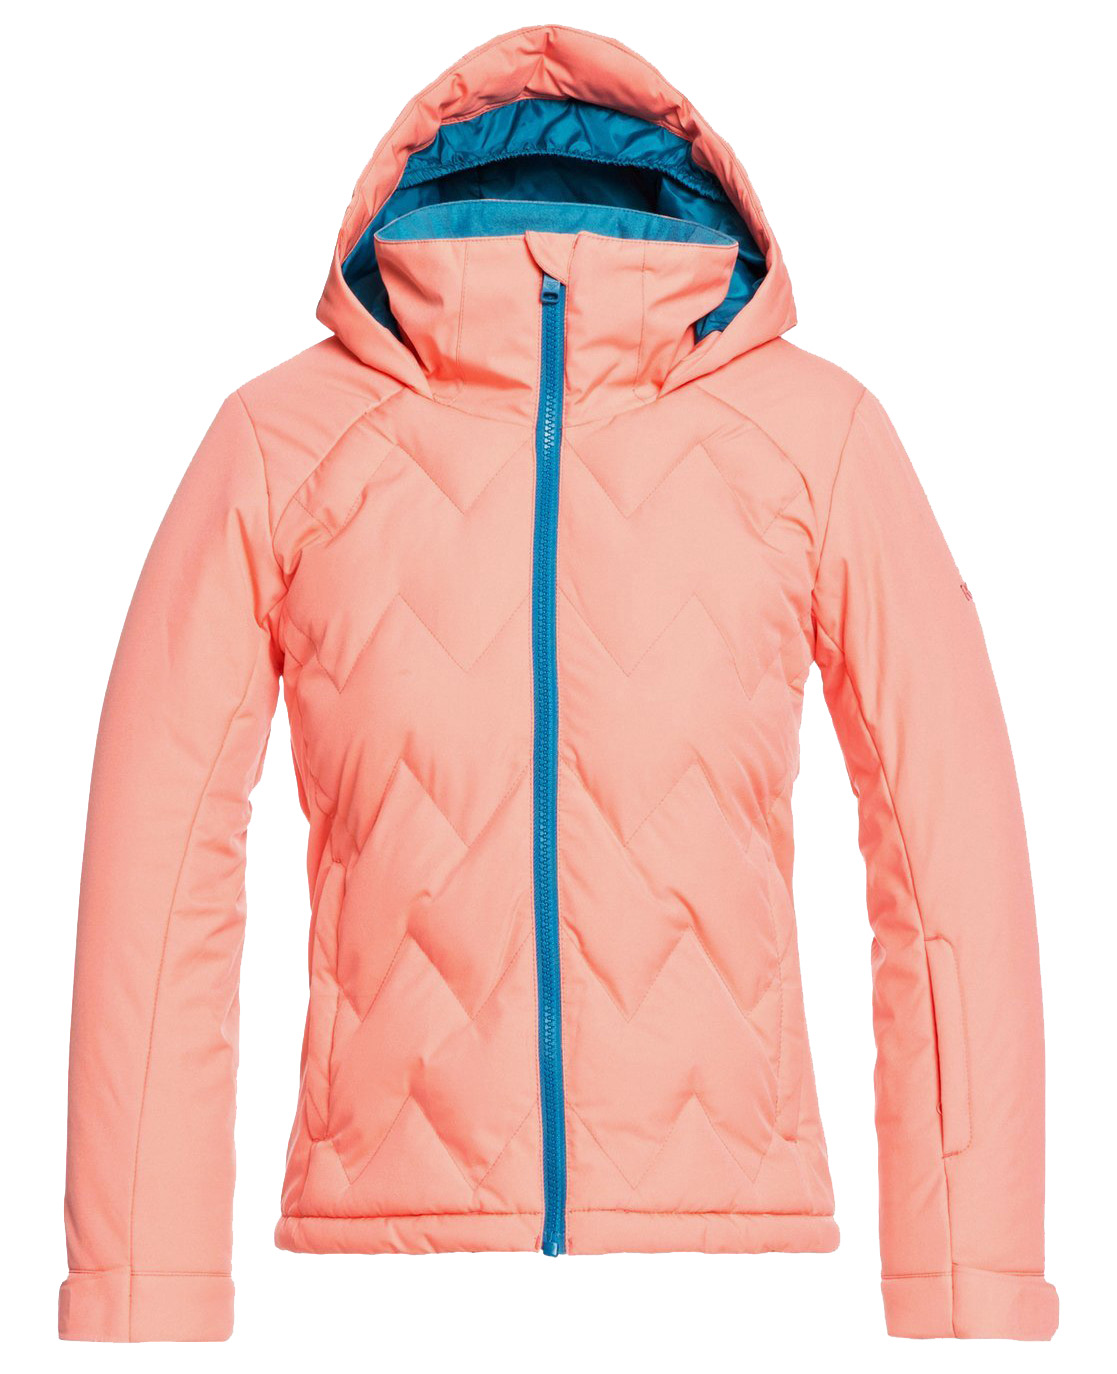 Куртка Сноубордическая Roxy 2020-21 Breeze Fusion Coral (Возраст:10)